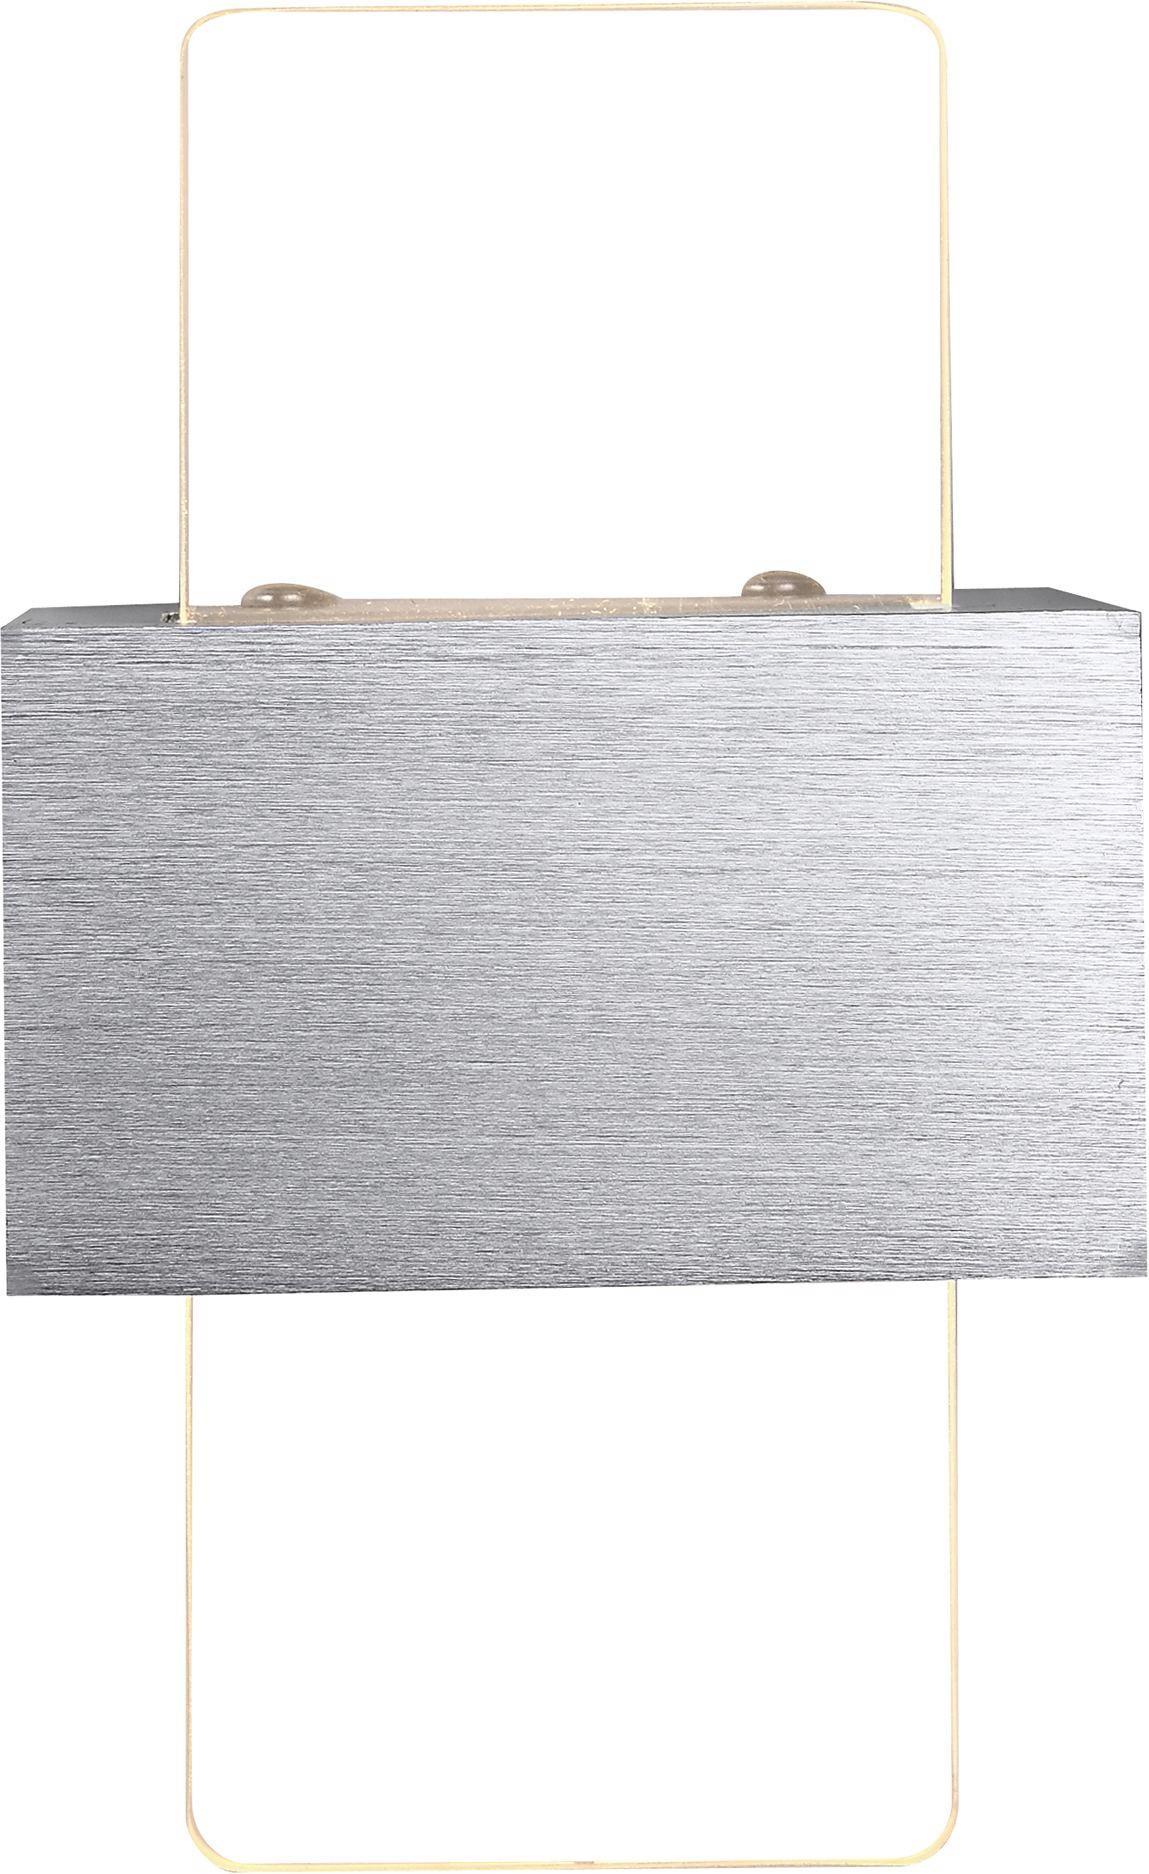 Wandleuchte Isaac - KONVENTIONELL, Kunststoff/Metall (14/8,5cm)